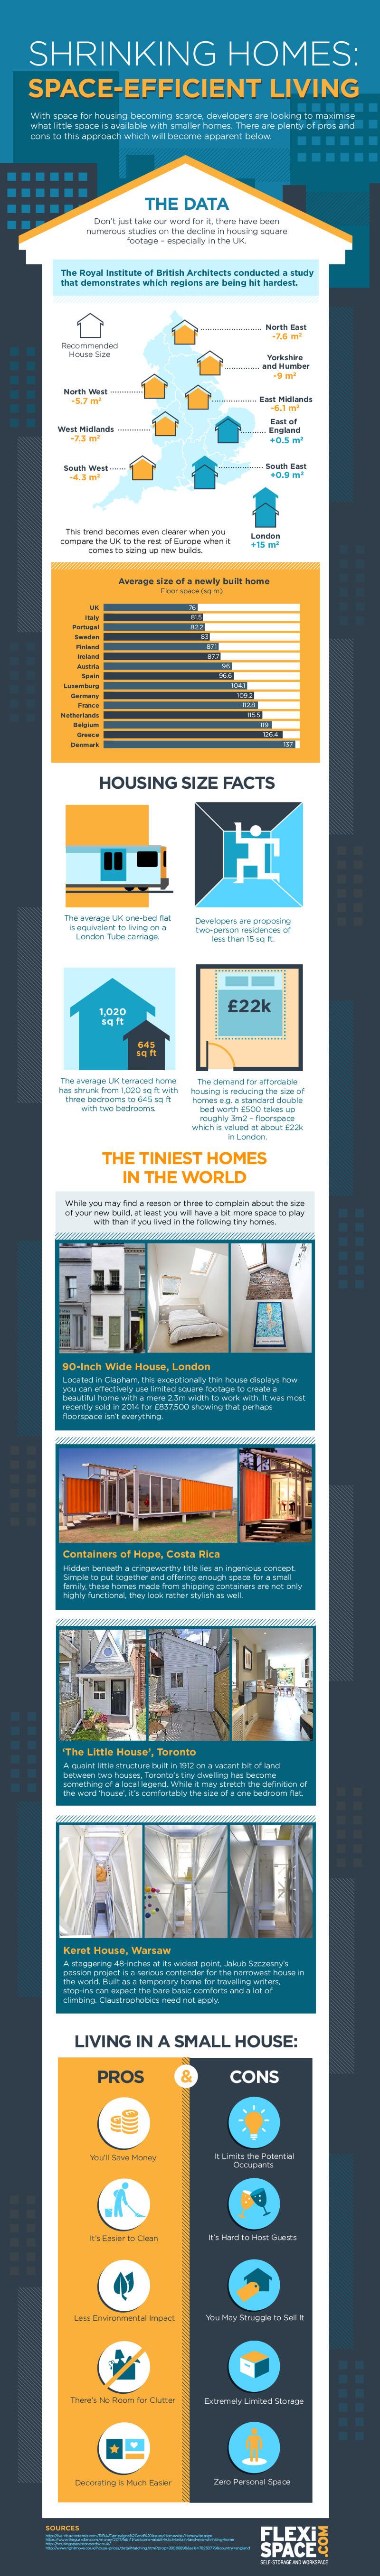 Shrinking-Homes-Final-infographic-galleryr